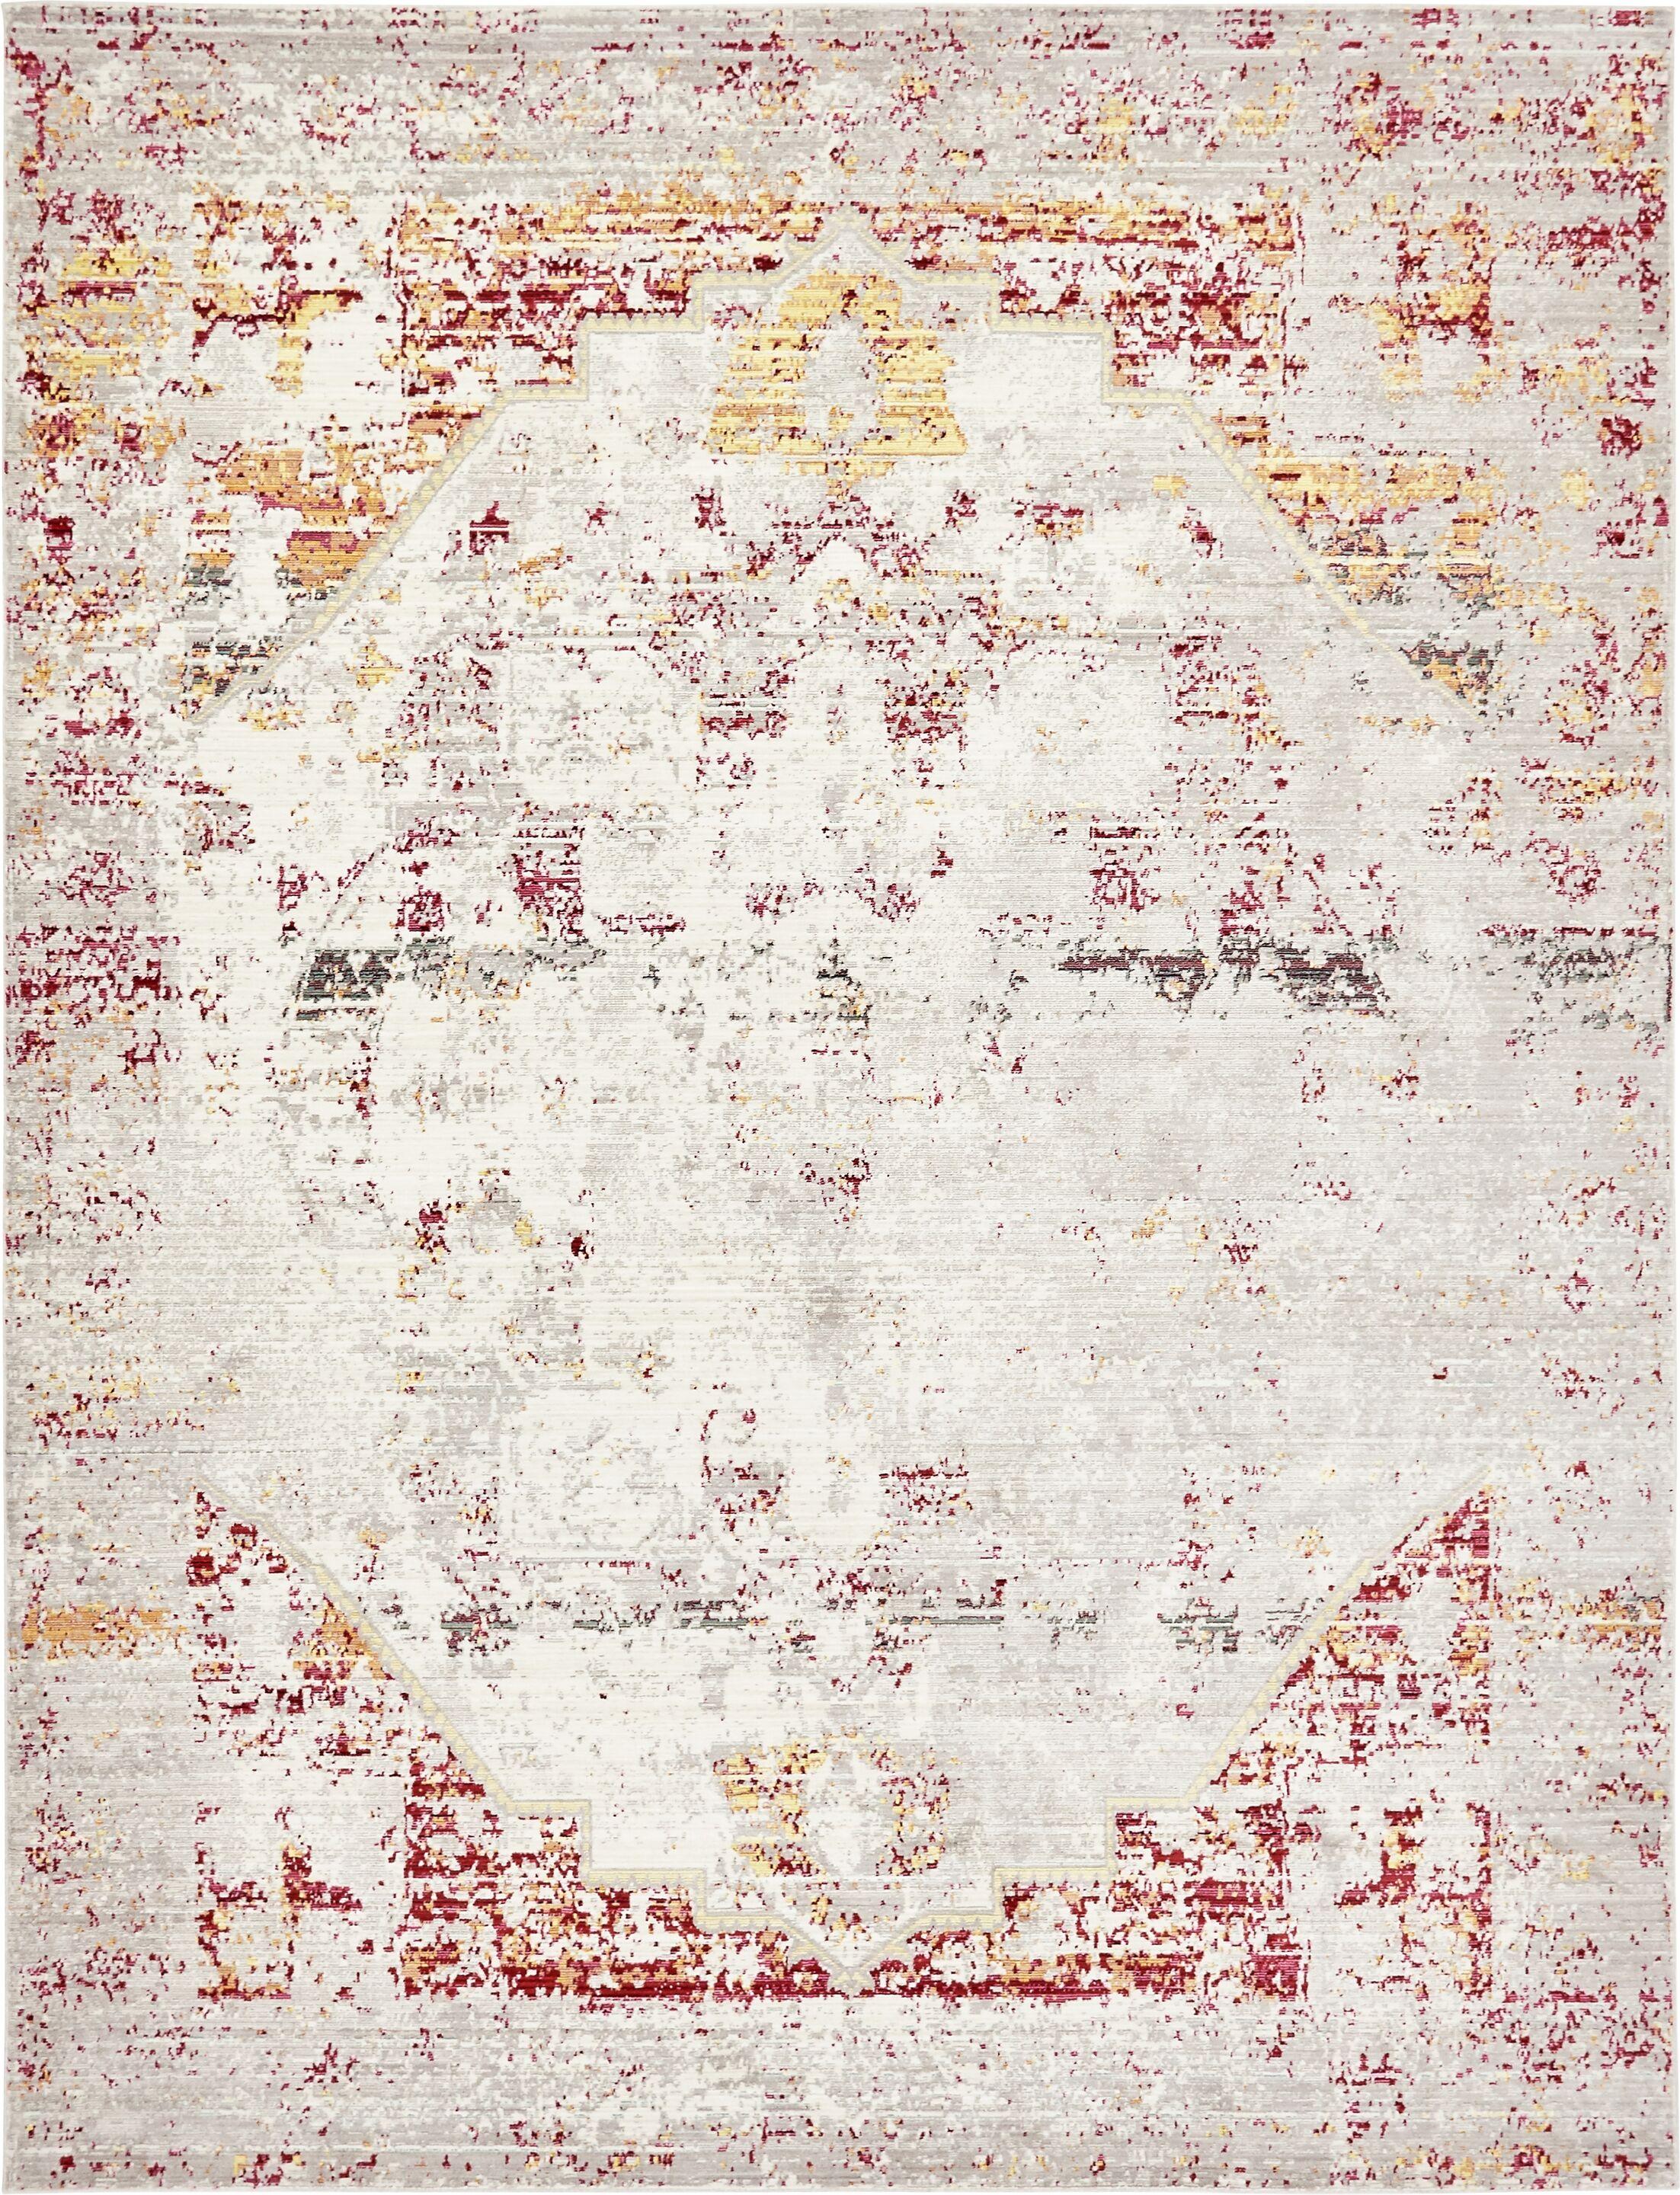 Carrico Tibetan Beige Area Rug Rug Size: Rectangle 9' x 12'